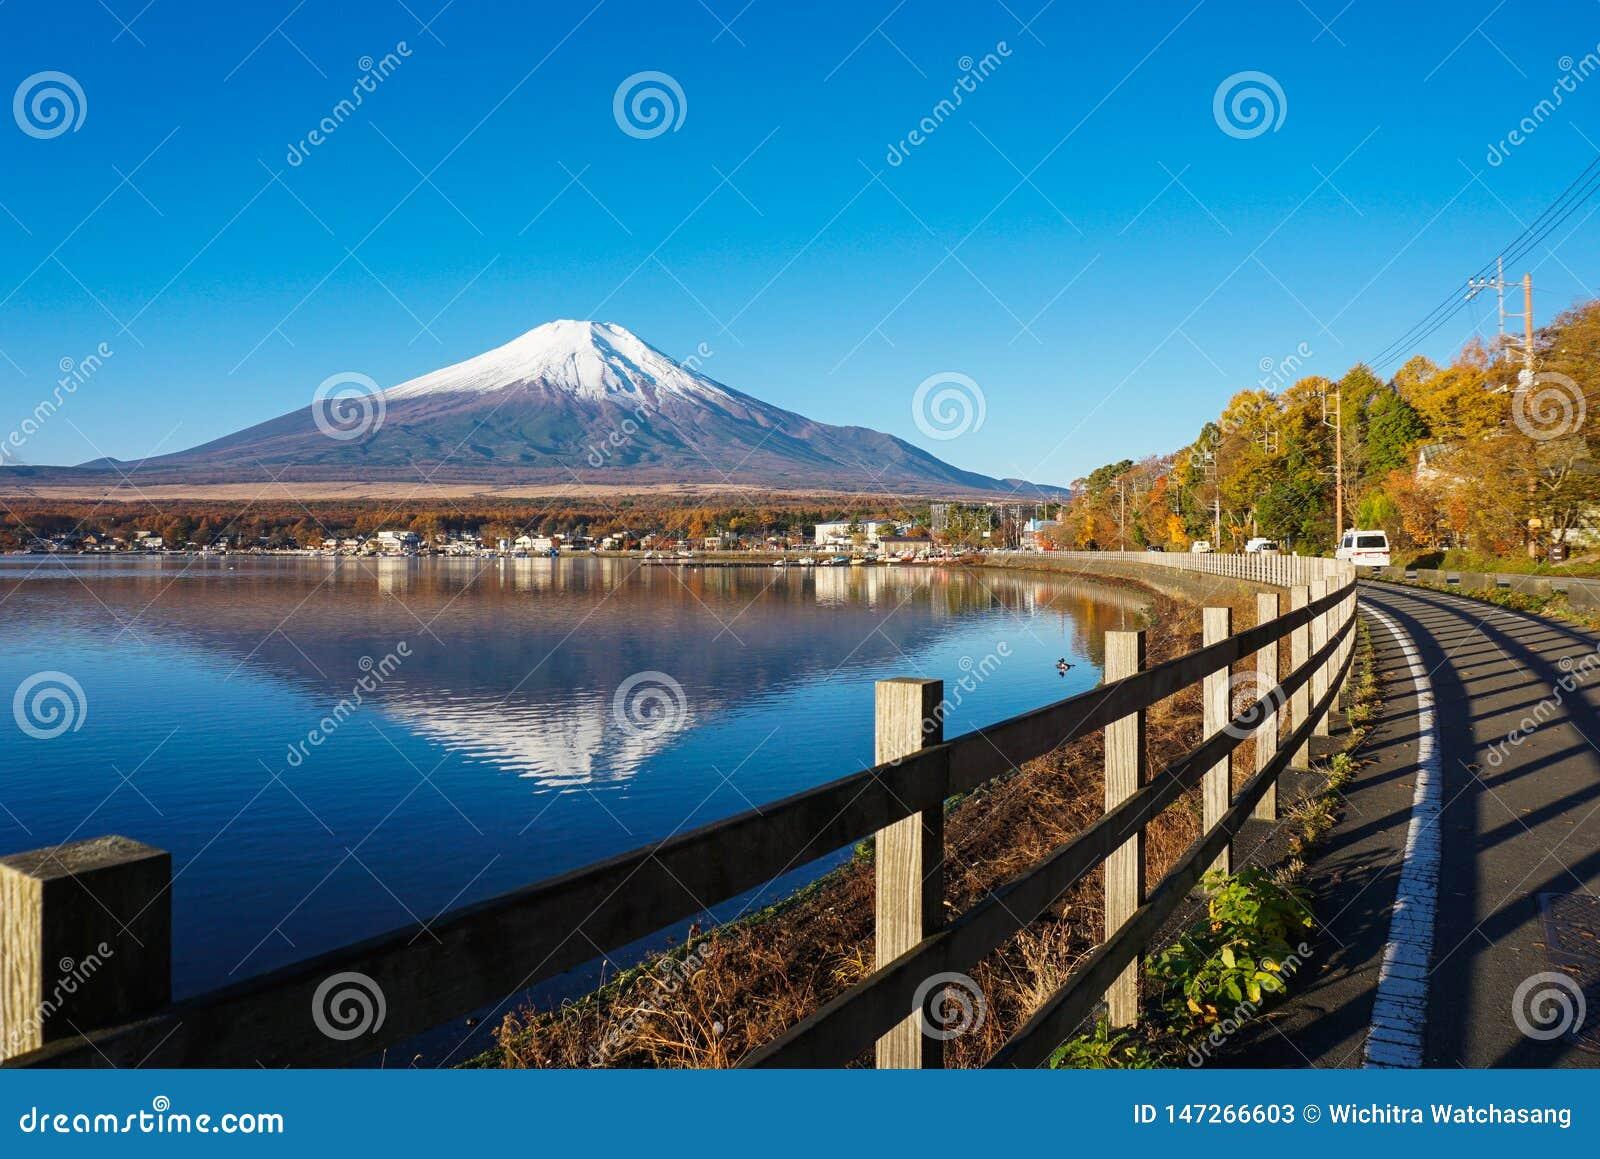 Mt富士在与反射的清早在湖山中,日本